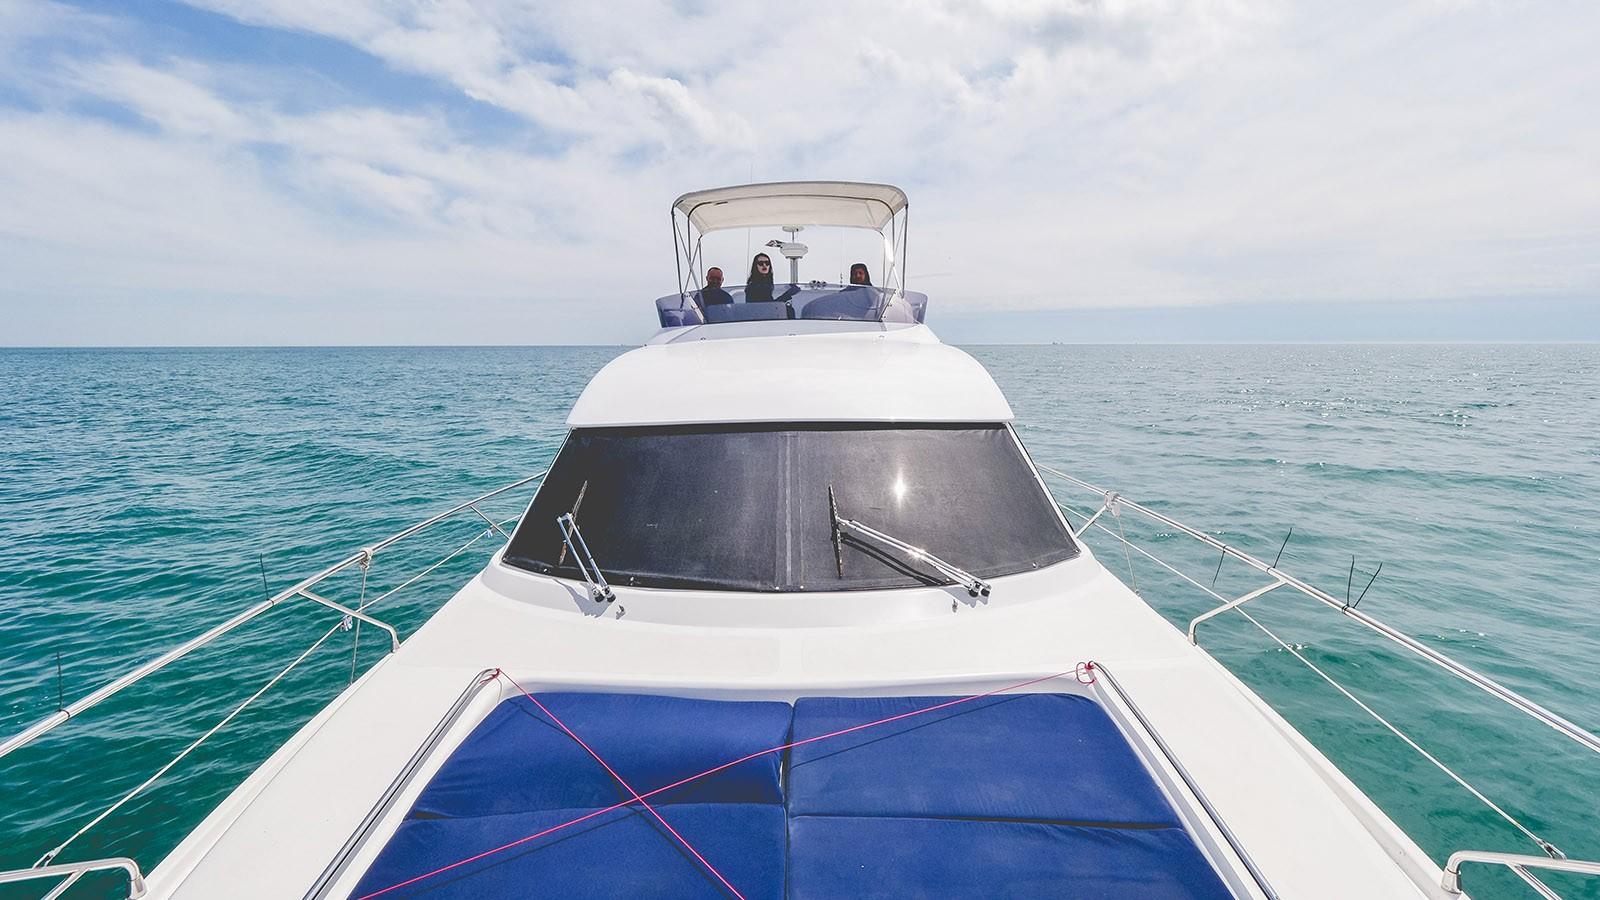 Experiențe unice pe yacht